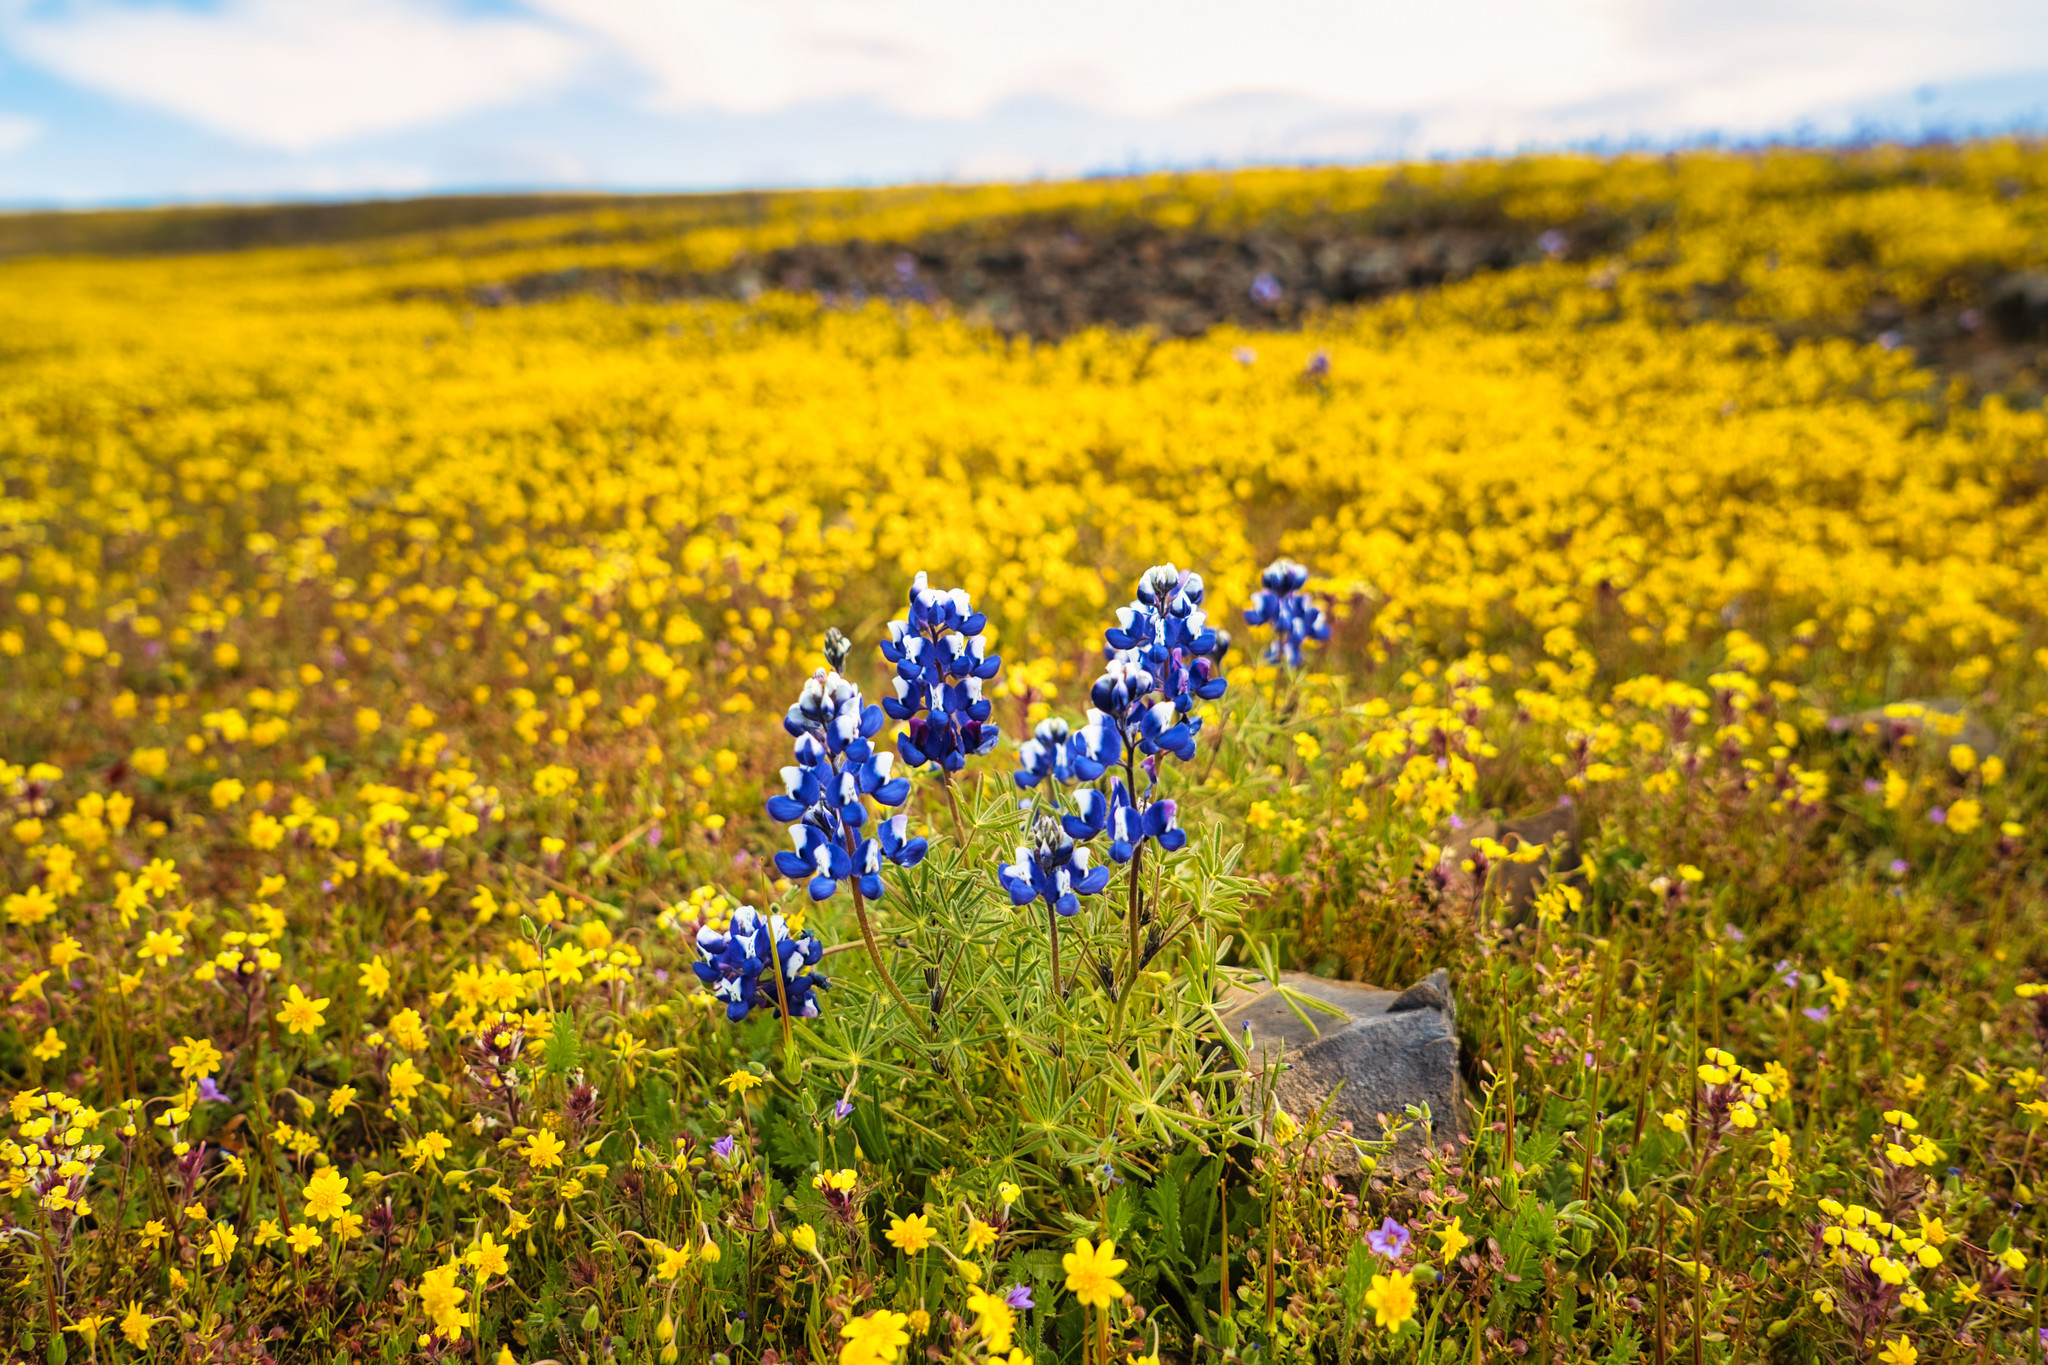 Fields and fields of flowers